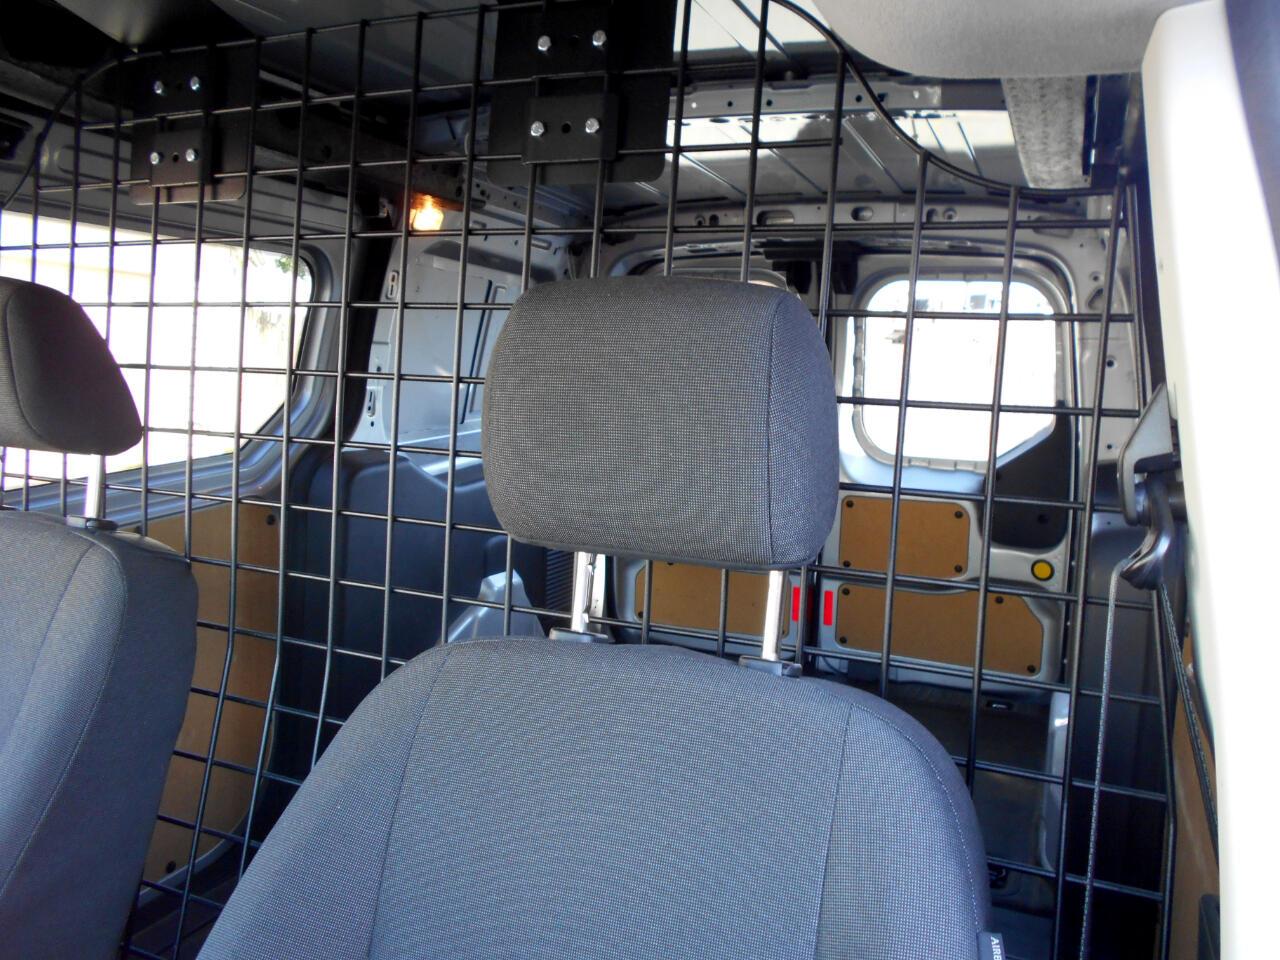 2016 Ford Transit Connect Cargo Van XLT LWB w/Rear 180 Degree Door